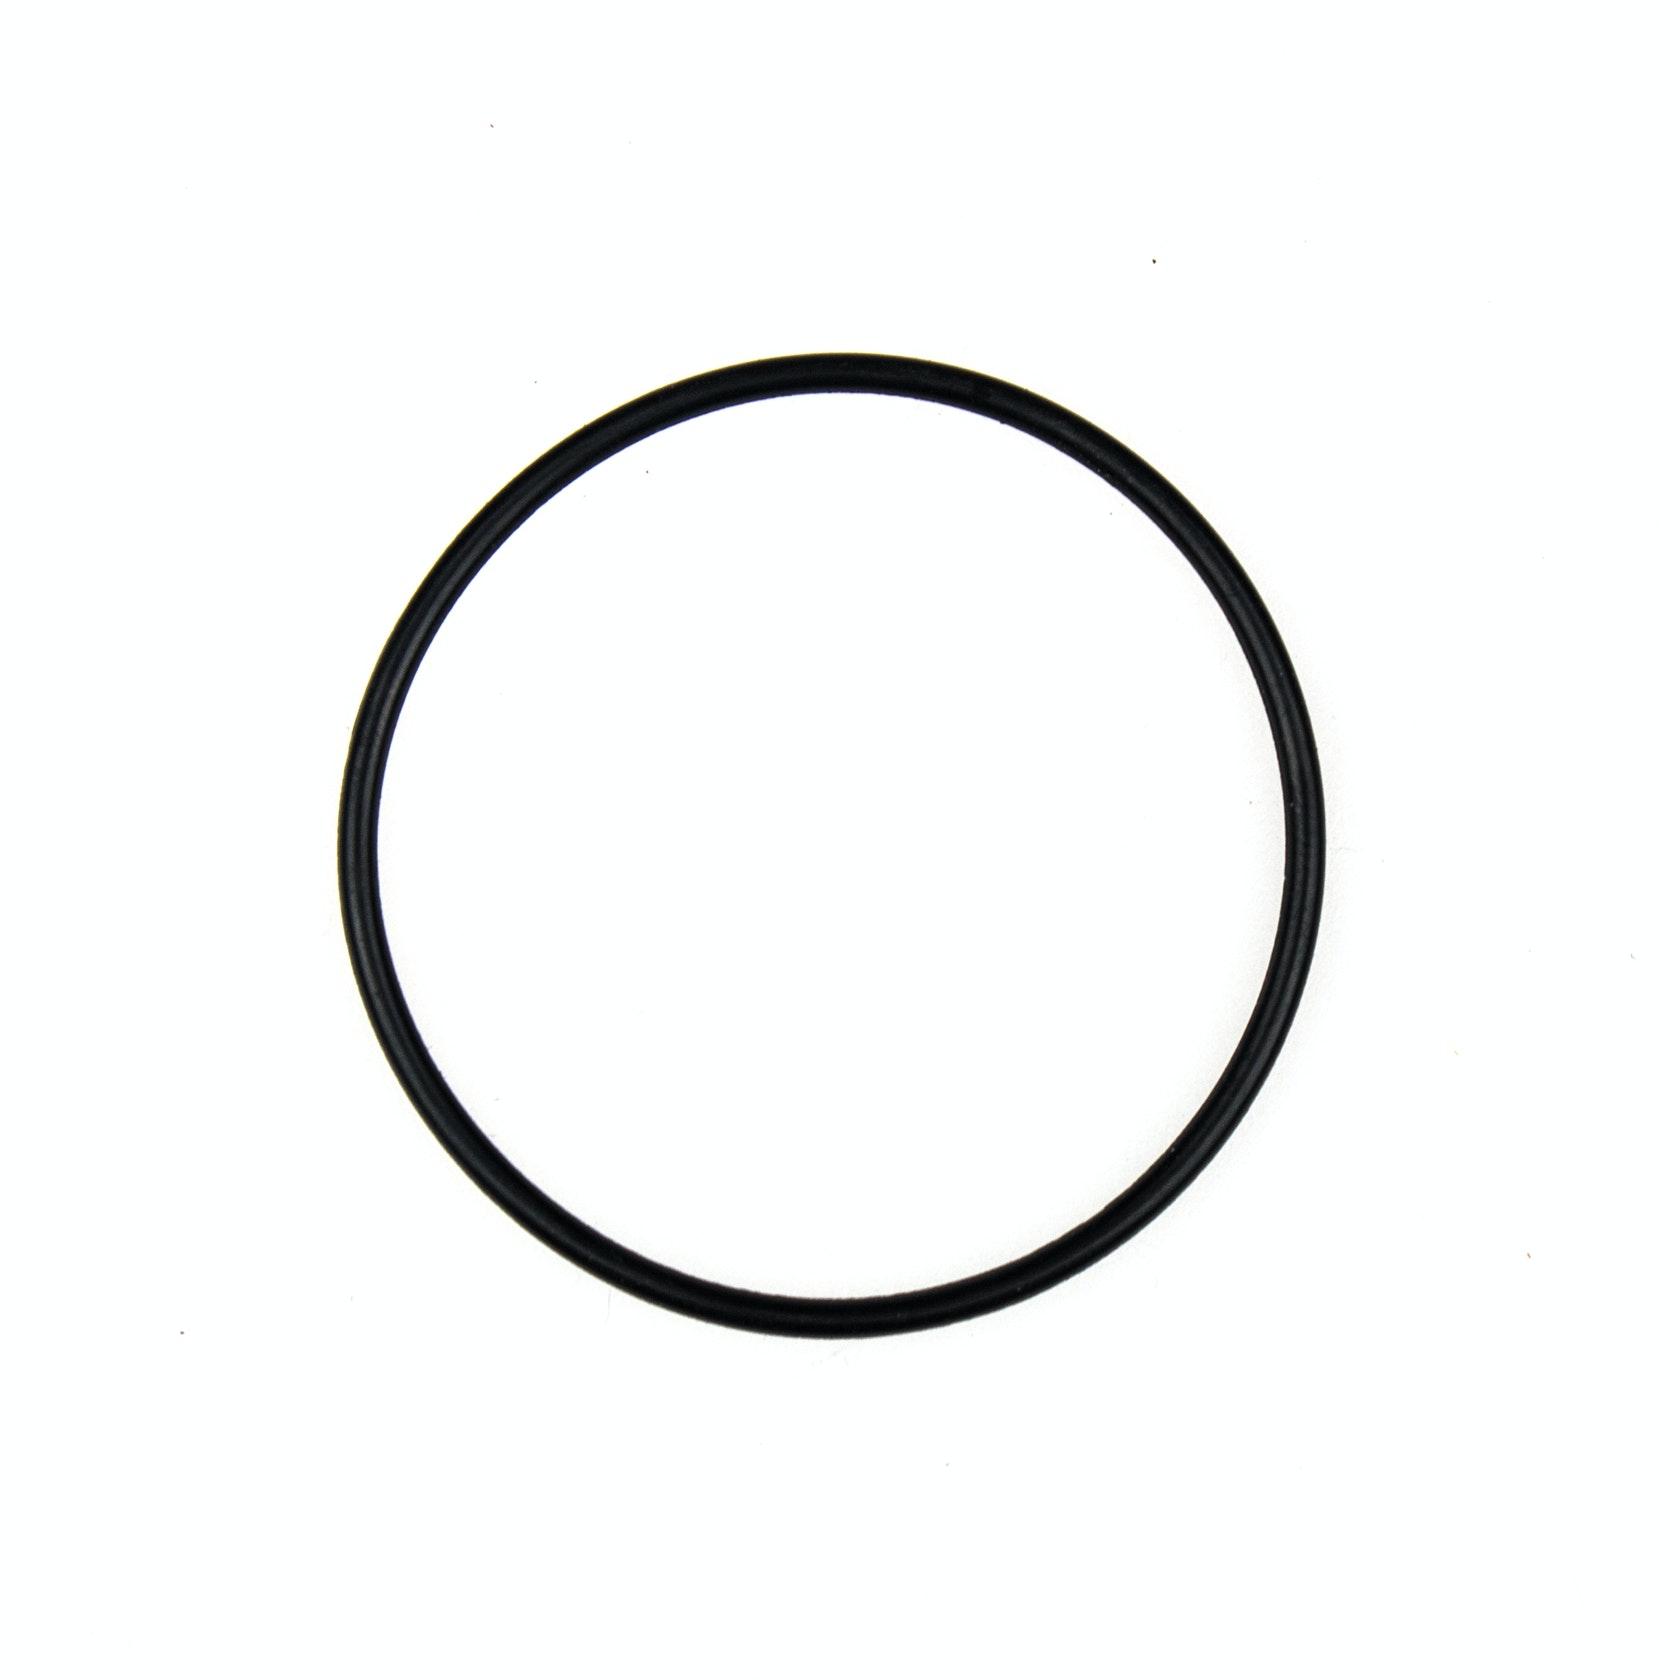 70A Innen /Ø:13,50mm Schnur/Ø:2,75mm Werkstoff:NBR 13,50x2,75 mm 70A NBR O-Ring